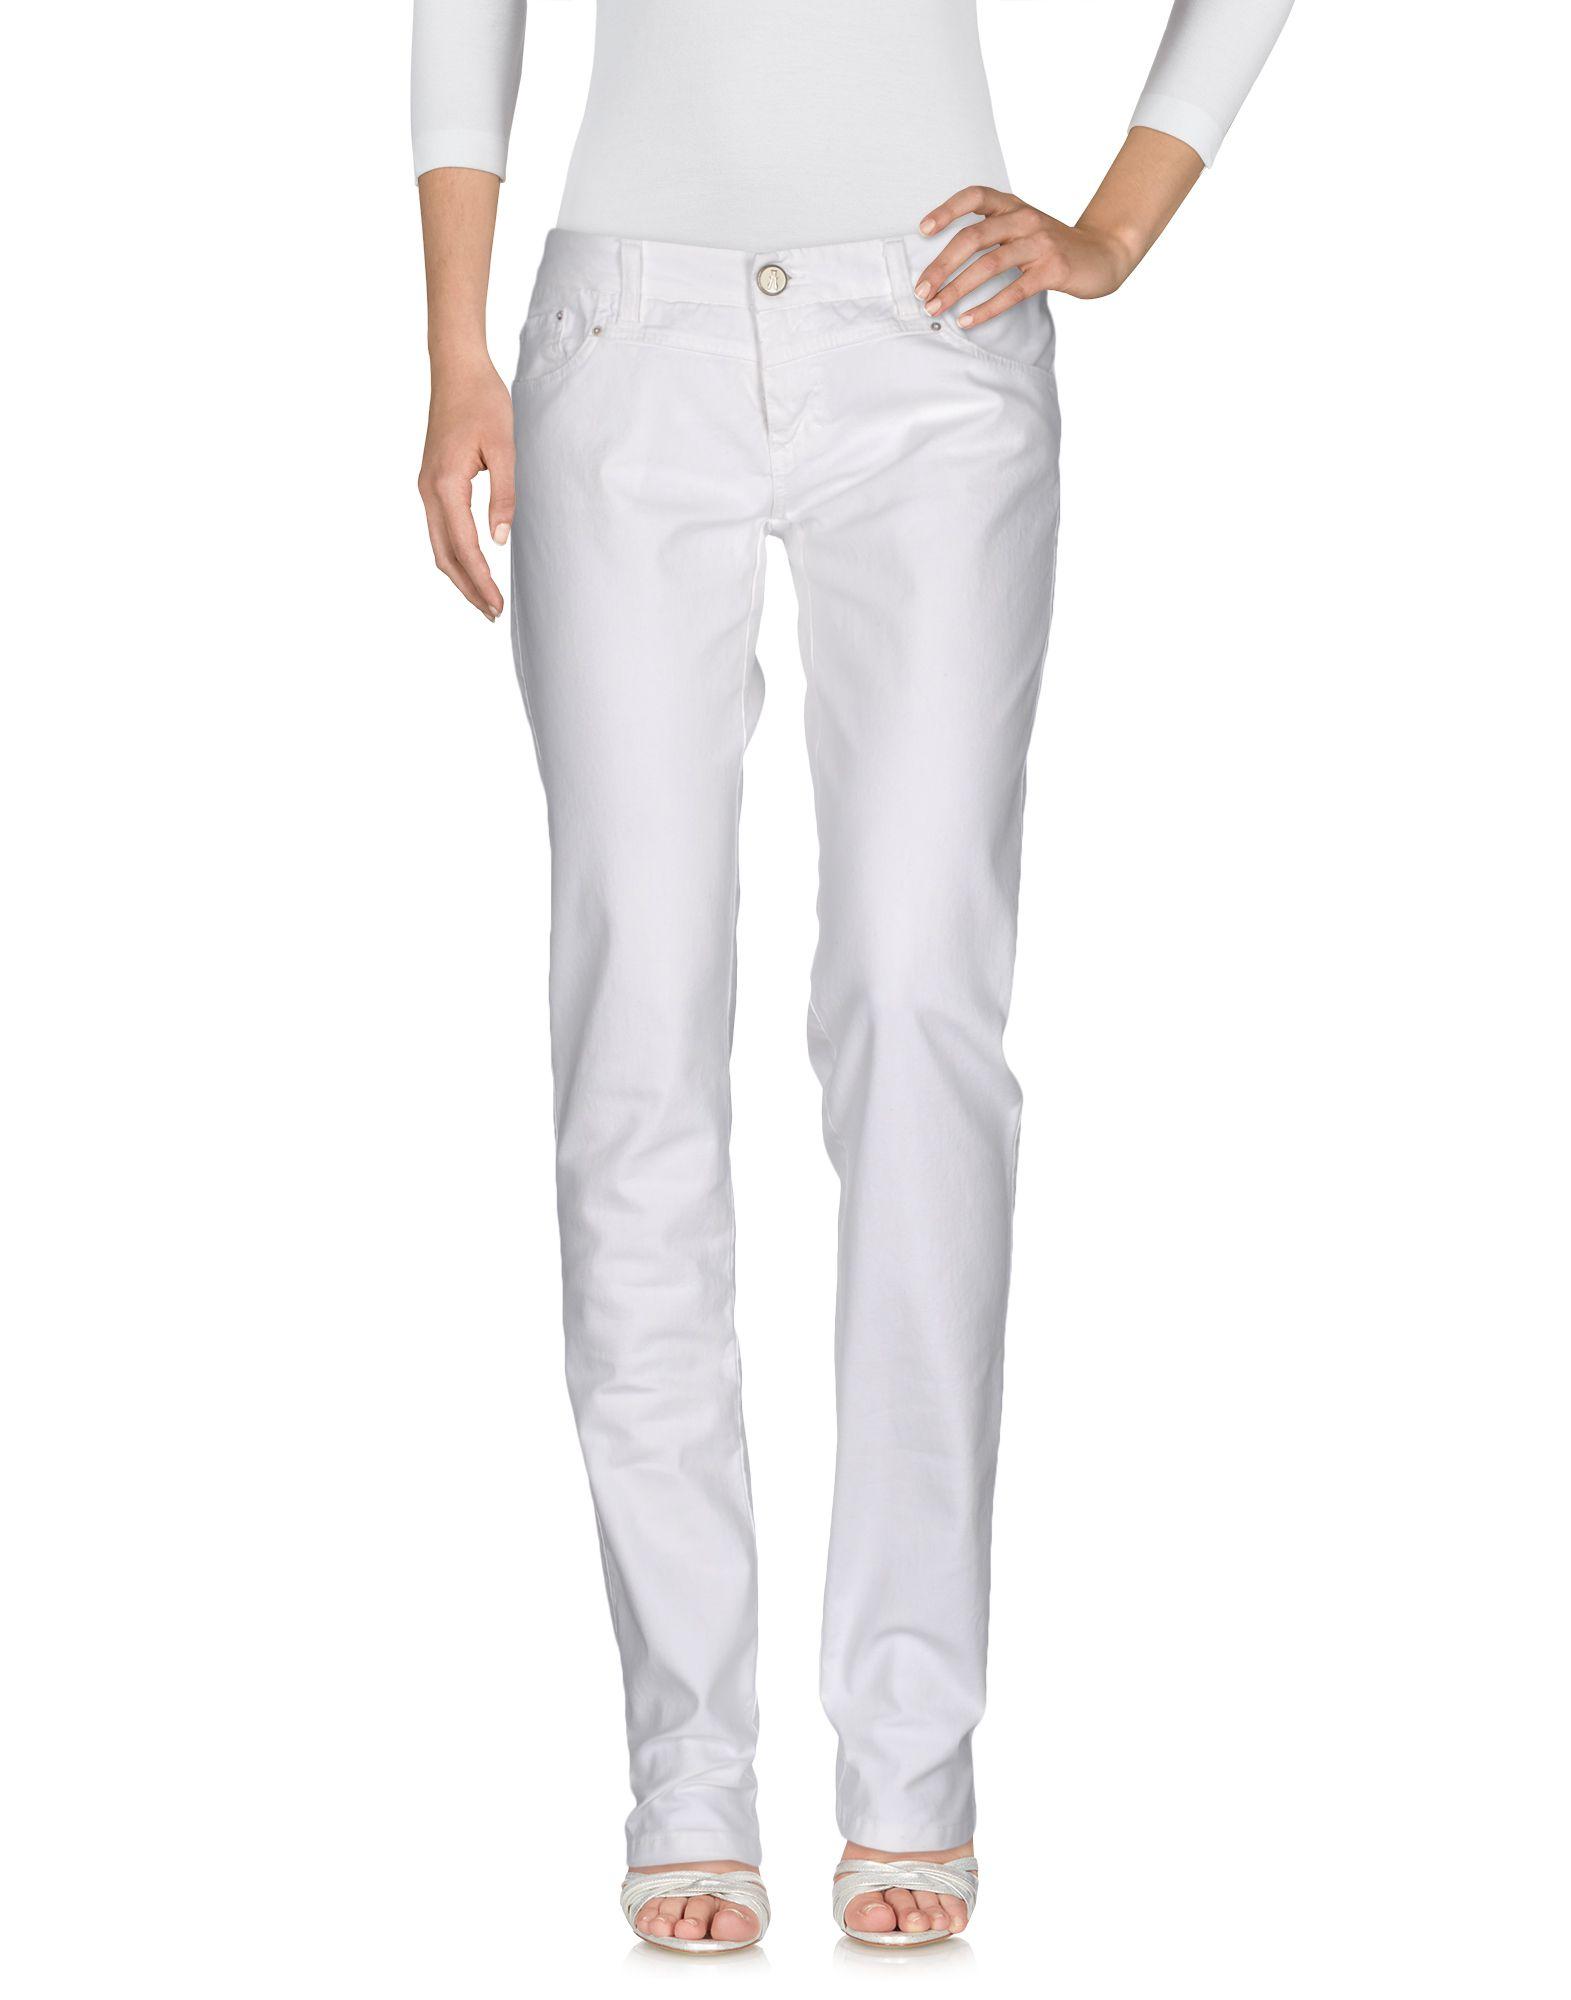 ANIYE BY Damen Jeanshose Farbe Weiß Größe 8